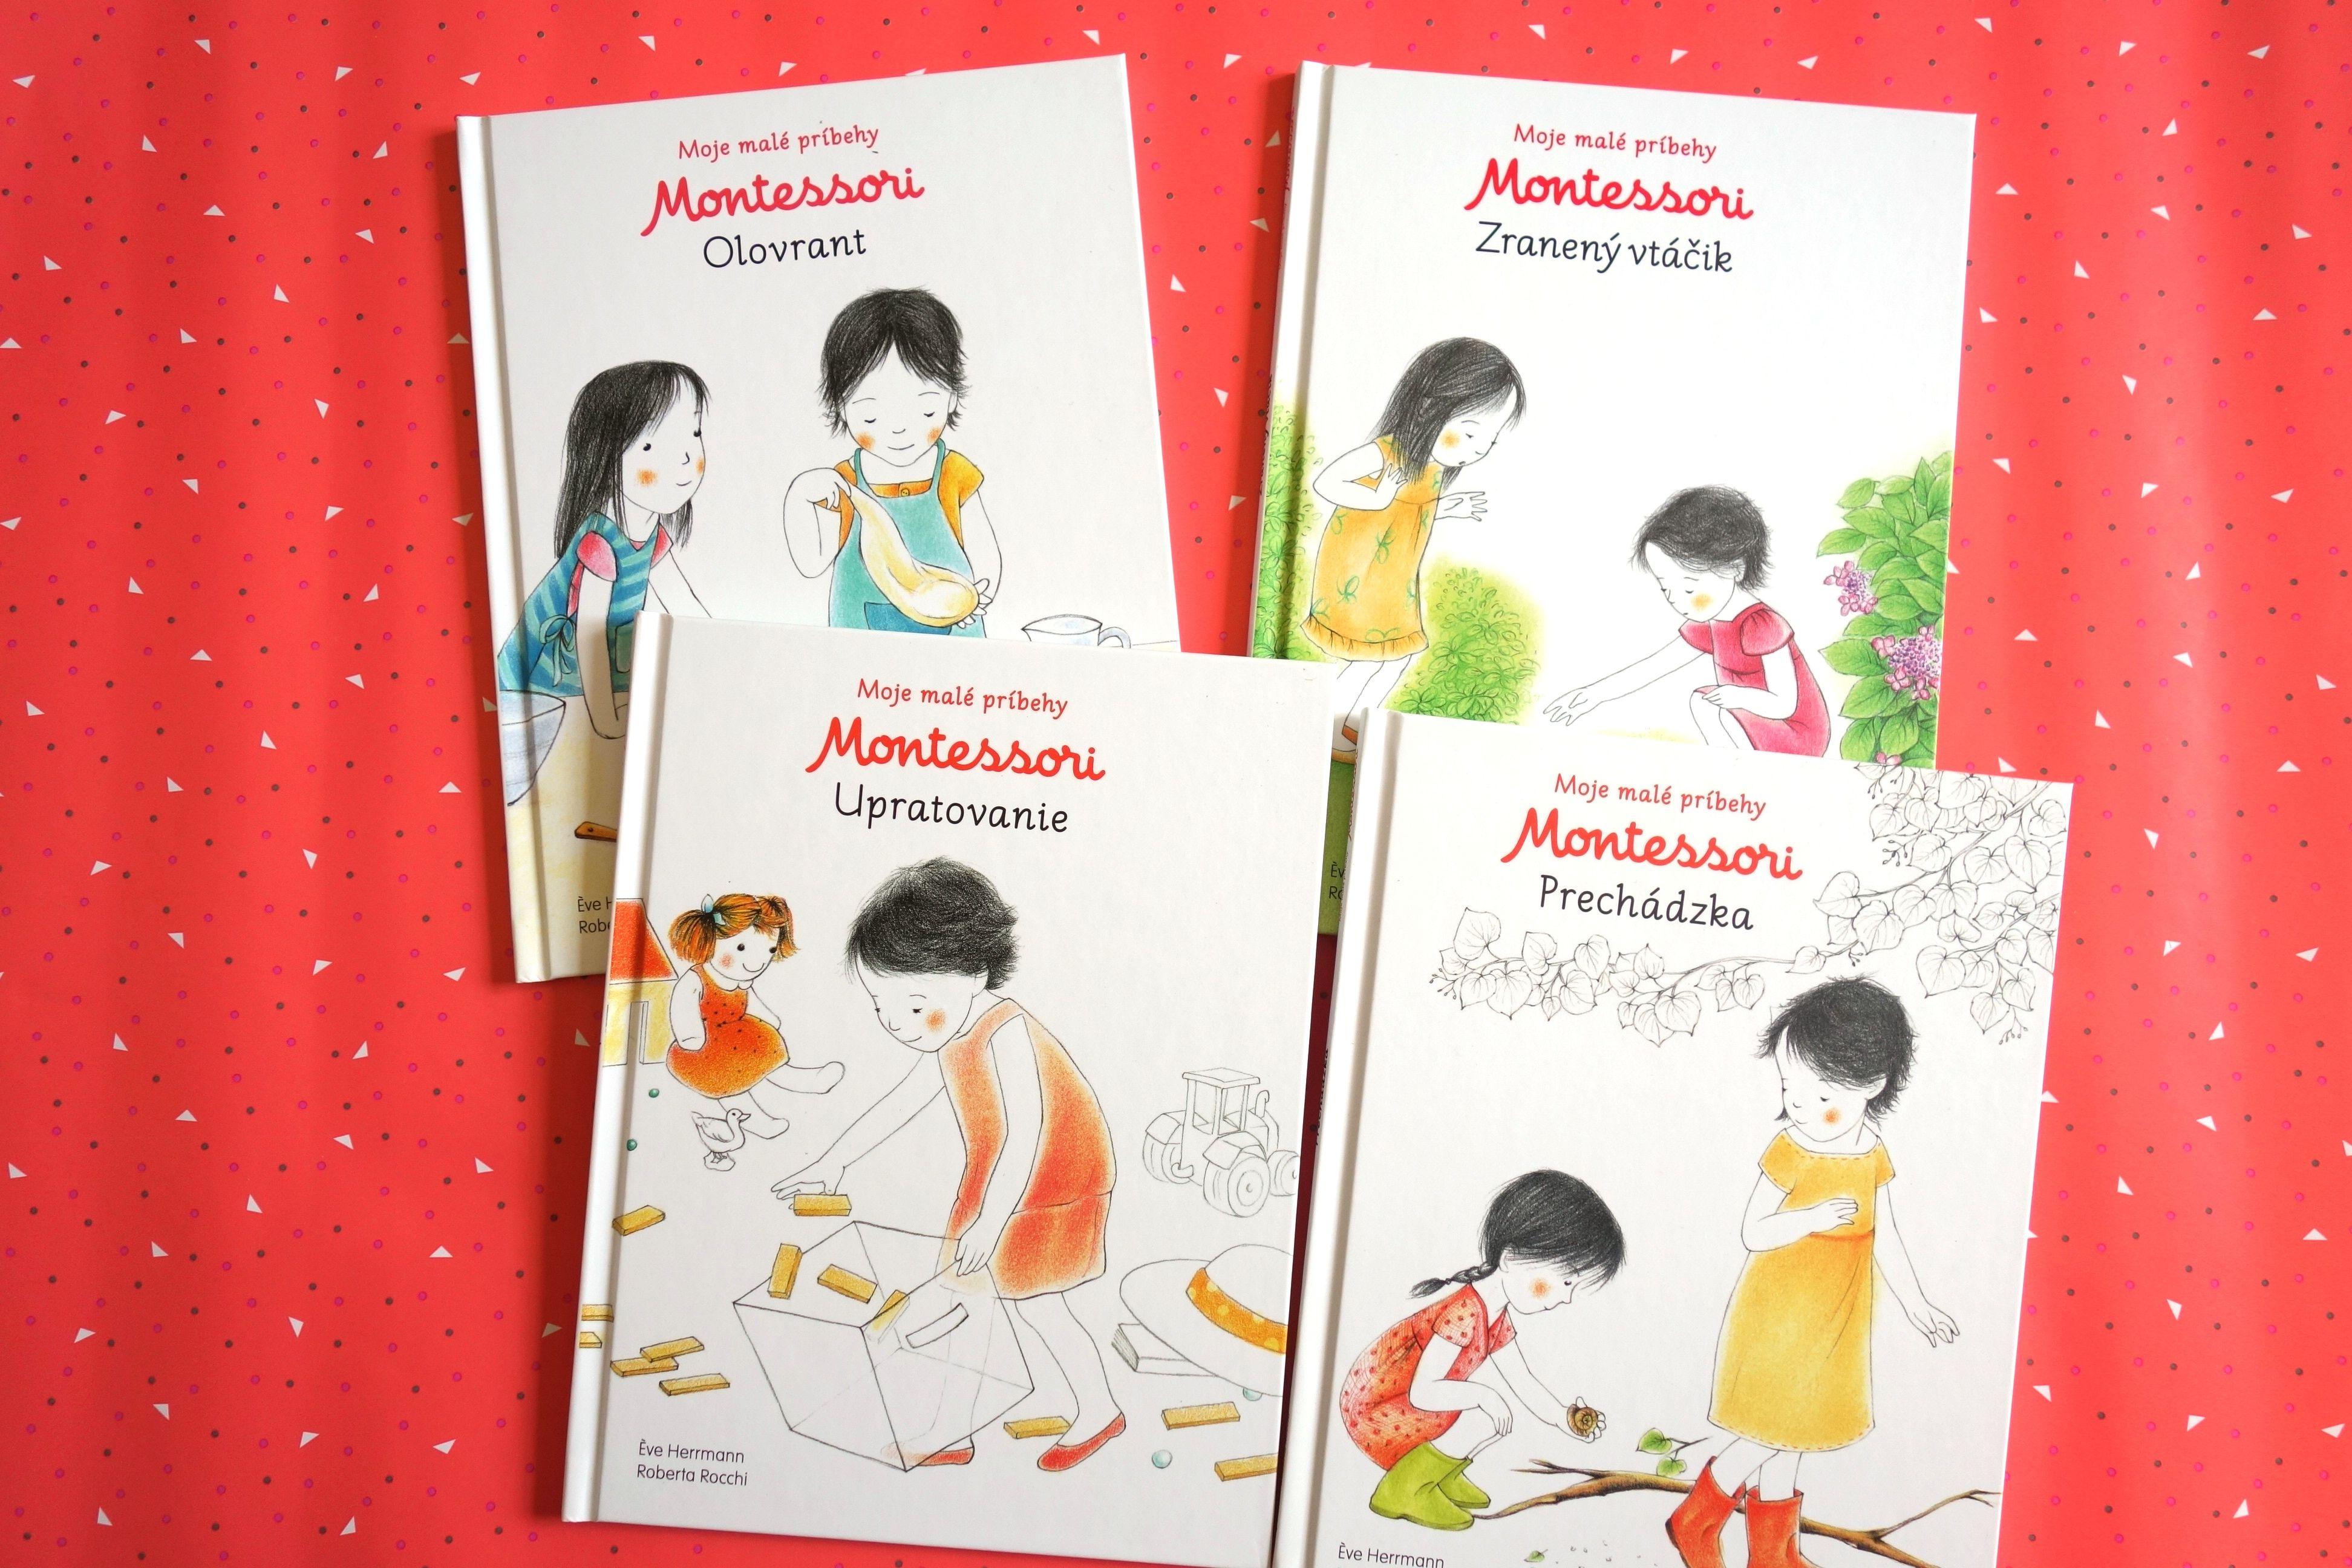 Balicek Montessori Pribehov 4 Za Cenu 3 Jednoduche Pribehy Zalozene Na Principoch Montessori Vychovy Ktore Detom Pomozu Spoznavat Montessori Book Cover Books